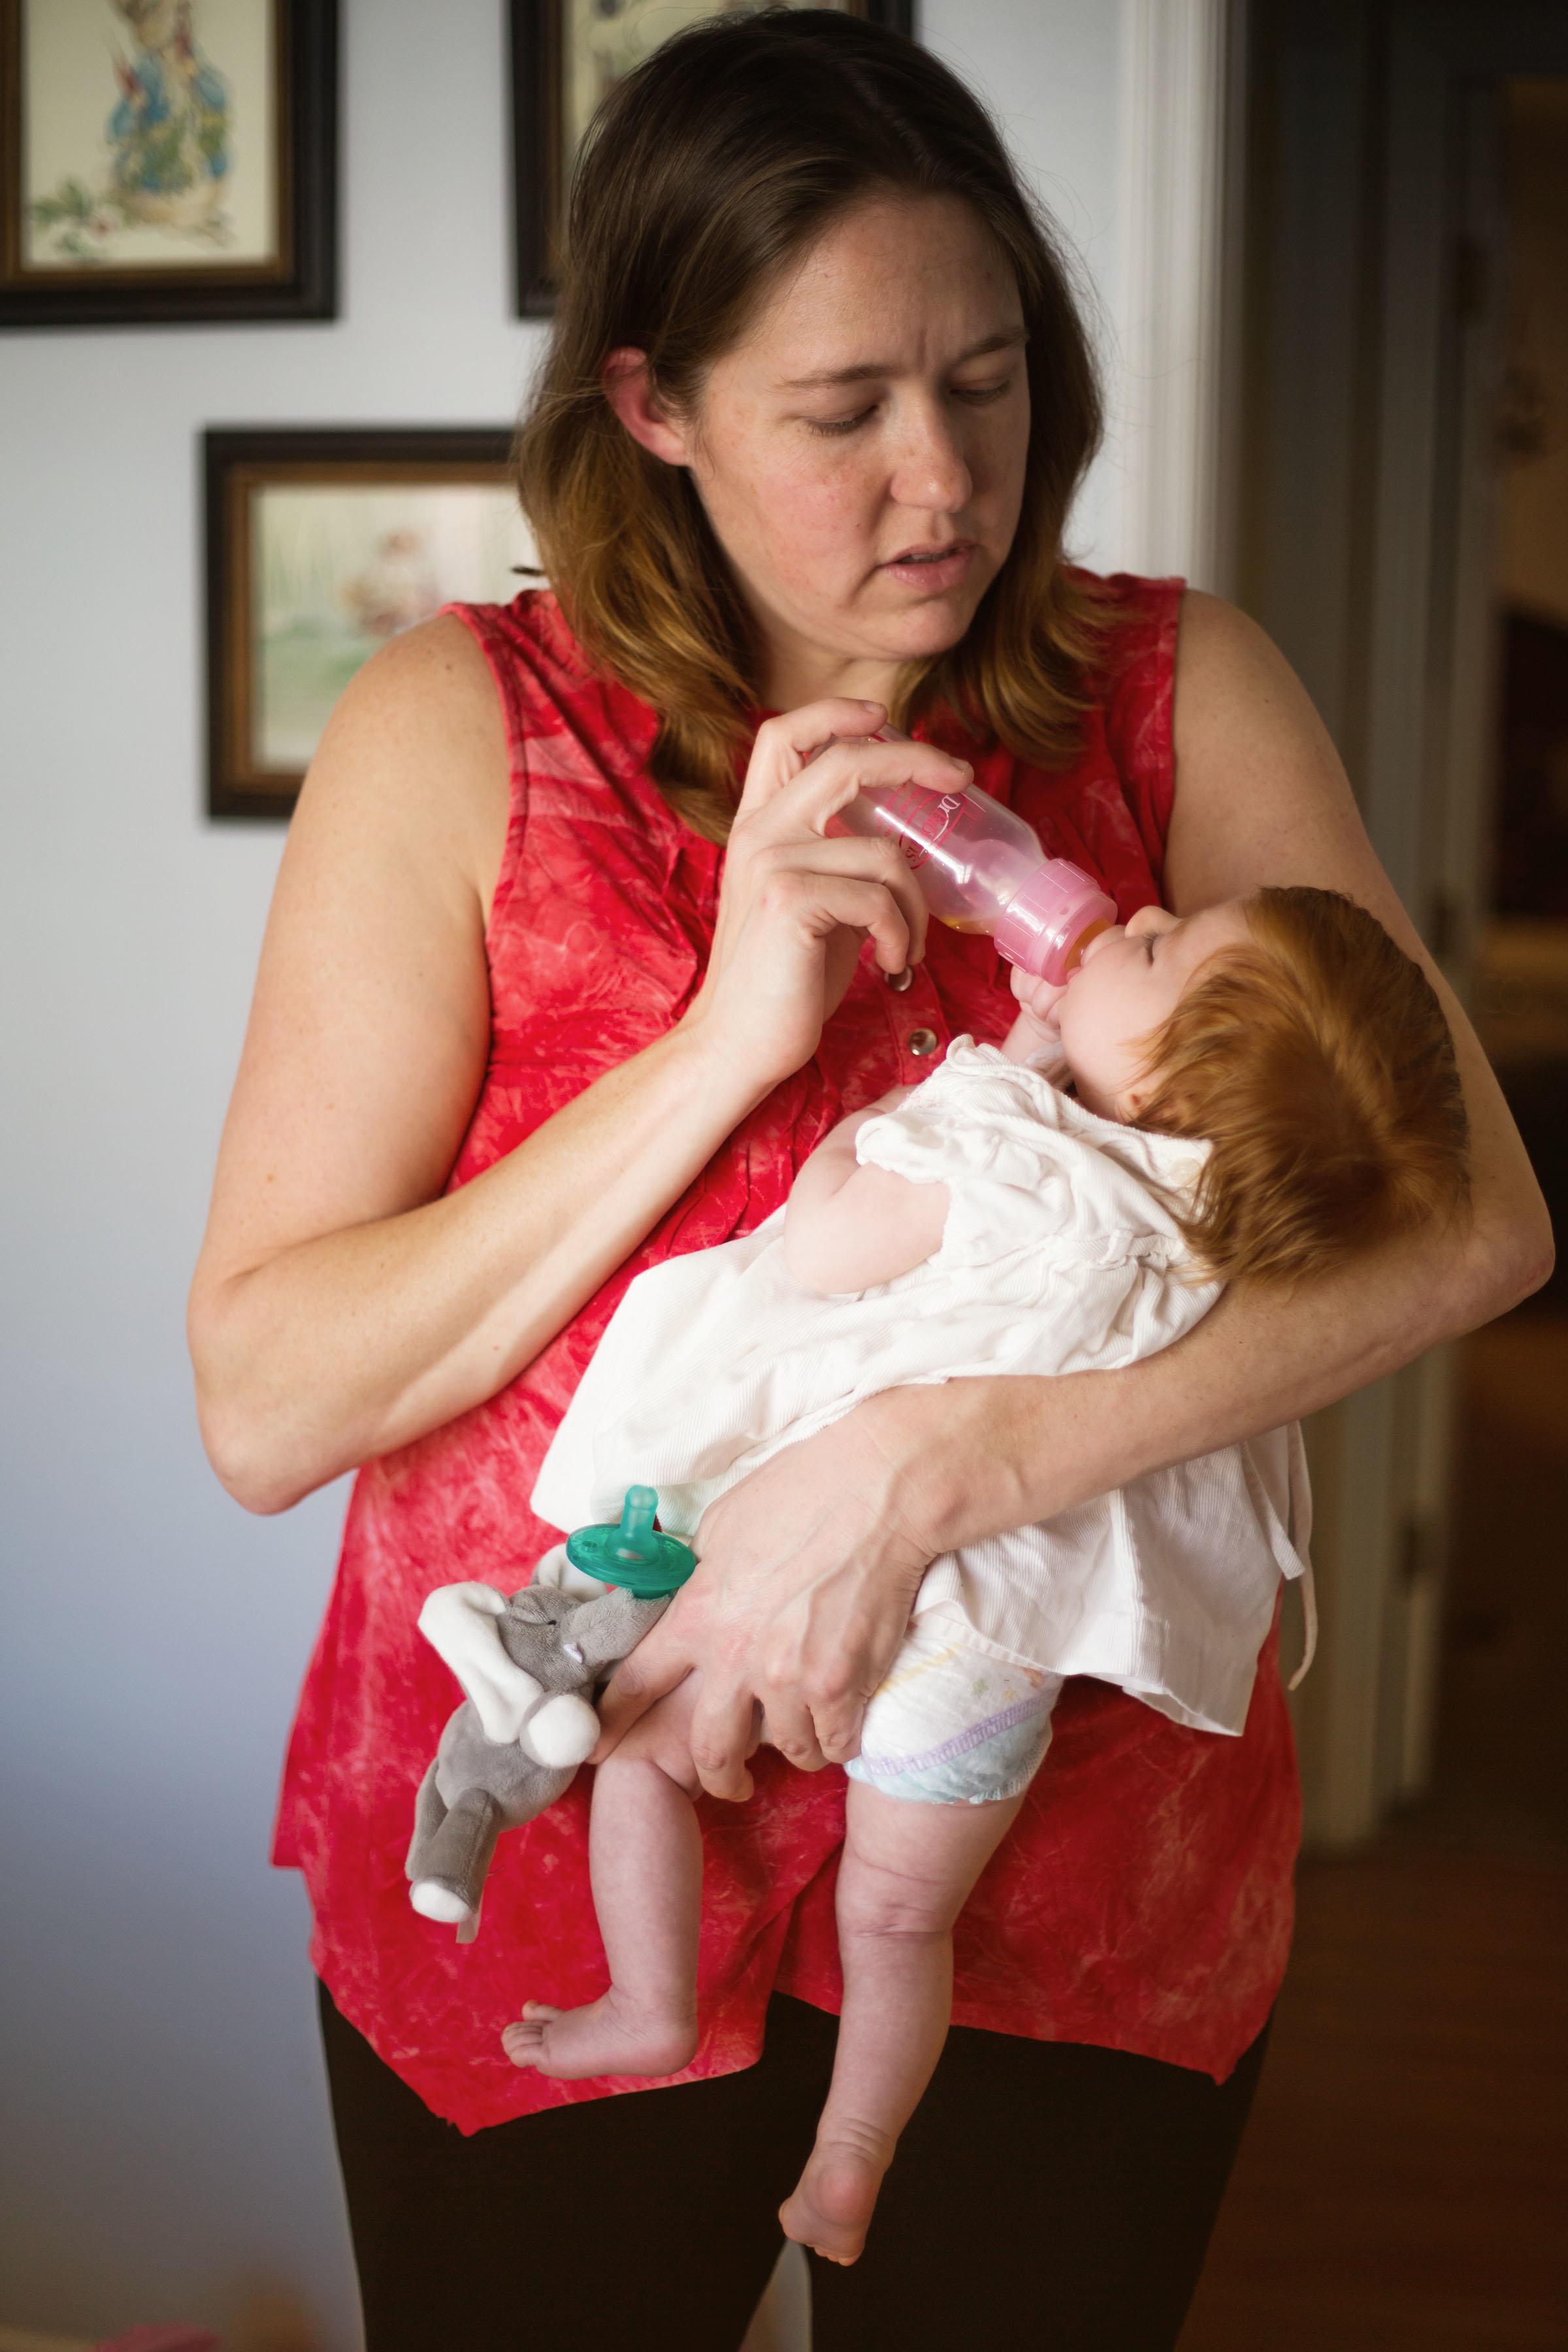 Wilmington-Newborn-Photographer-Tiffany-Abruzzo-Jordyn-12.jpg